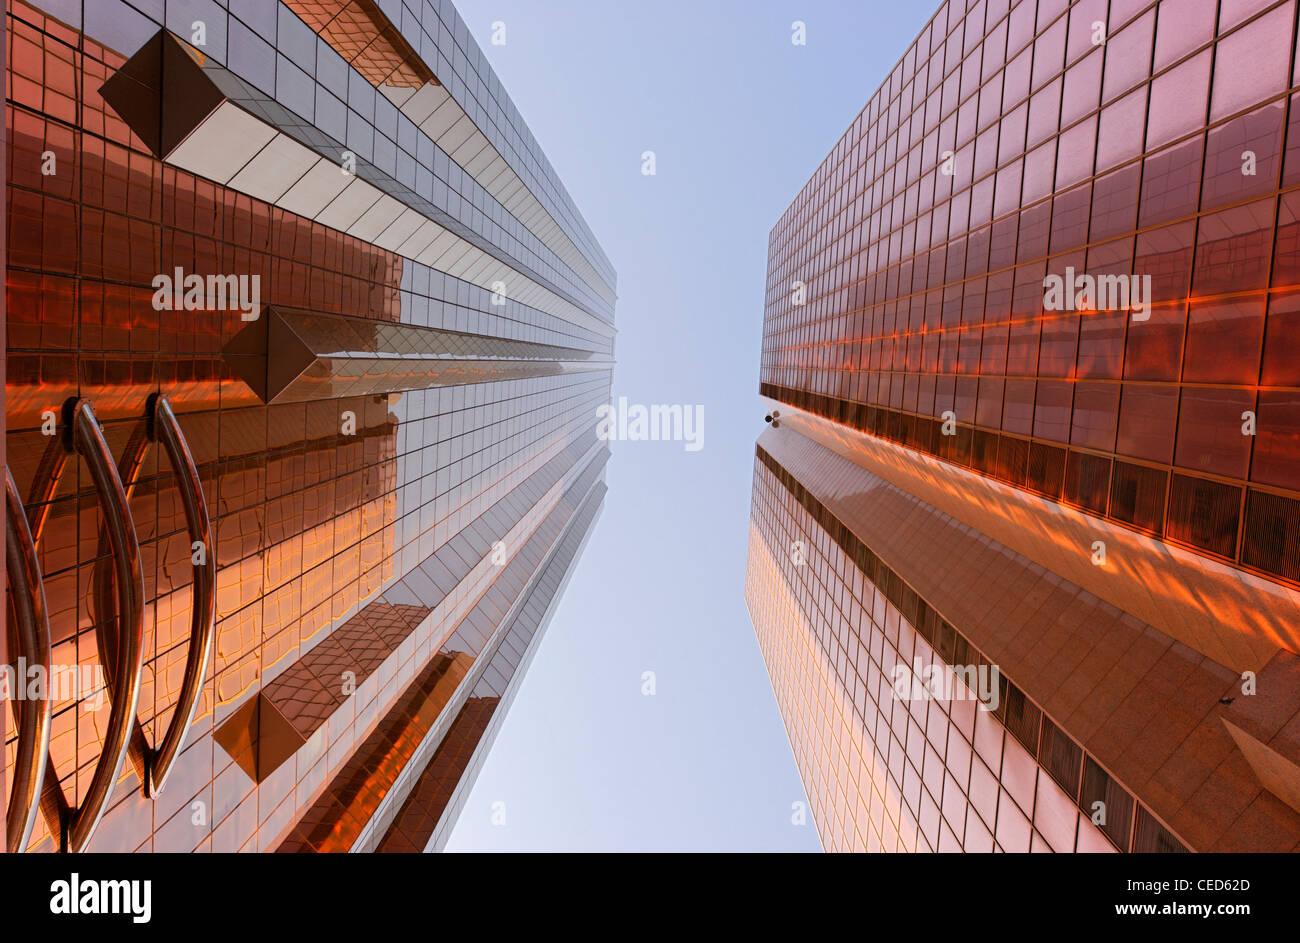 Copper-colored facades of office towers, modern architecture, Sheikh Zayed Road, Al Satwa, Dubai, United Arab Emirates Stock Foto